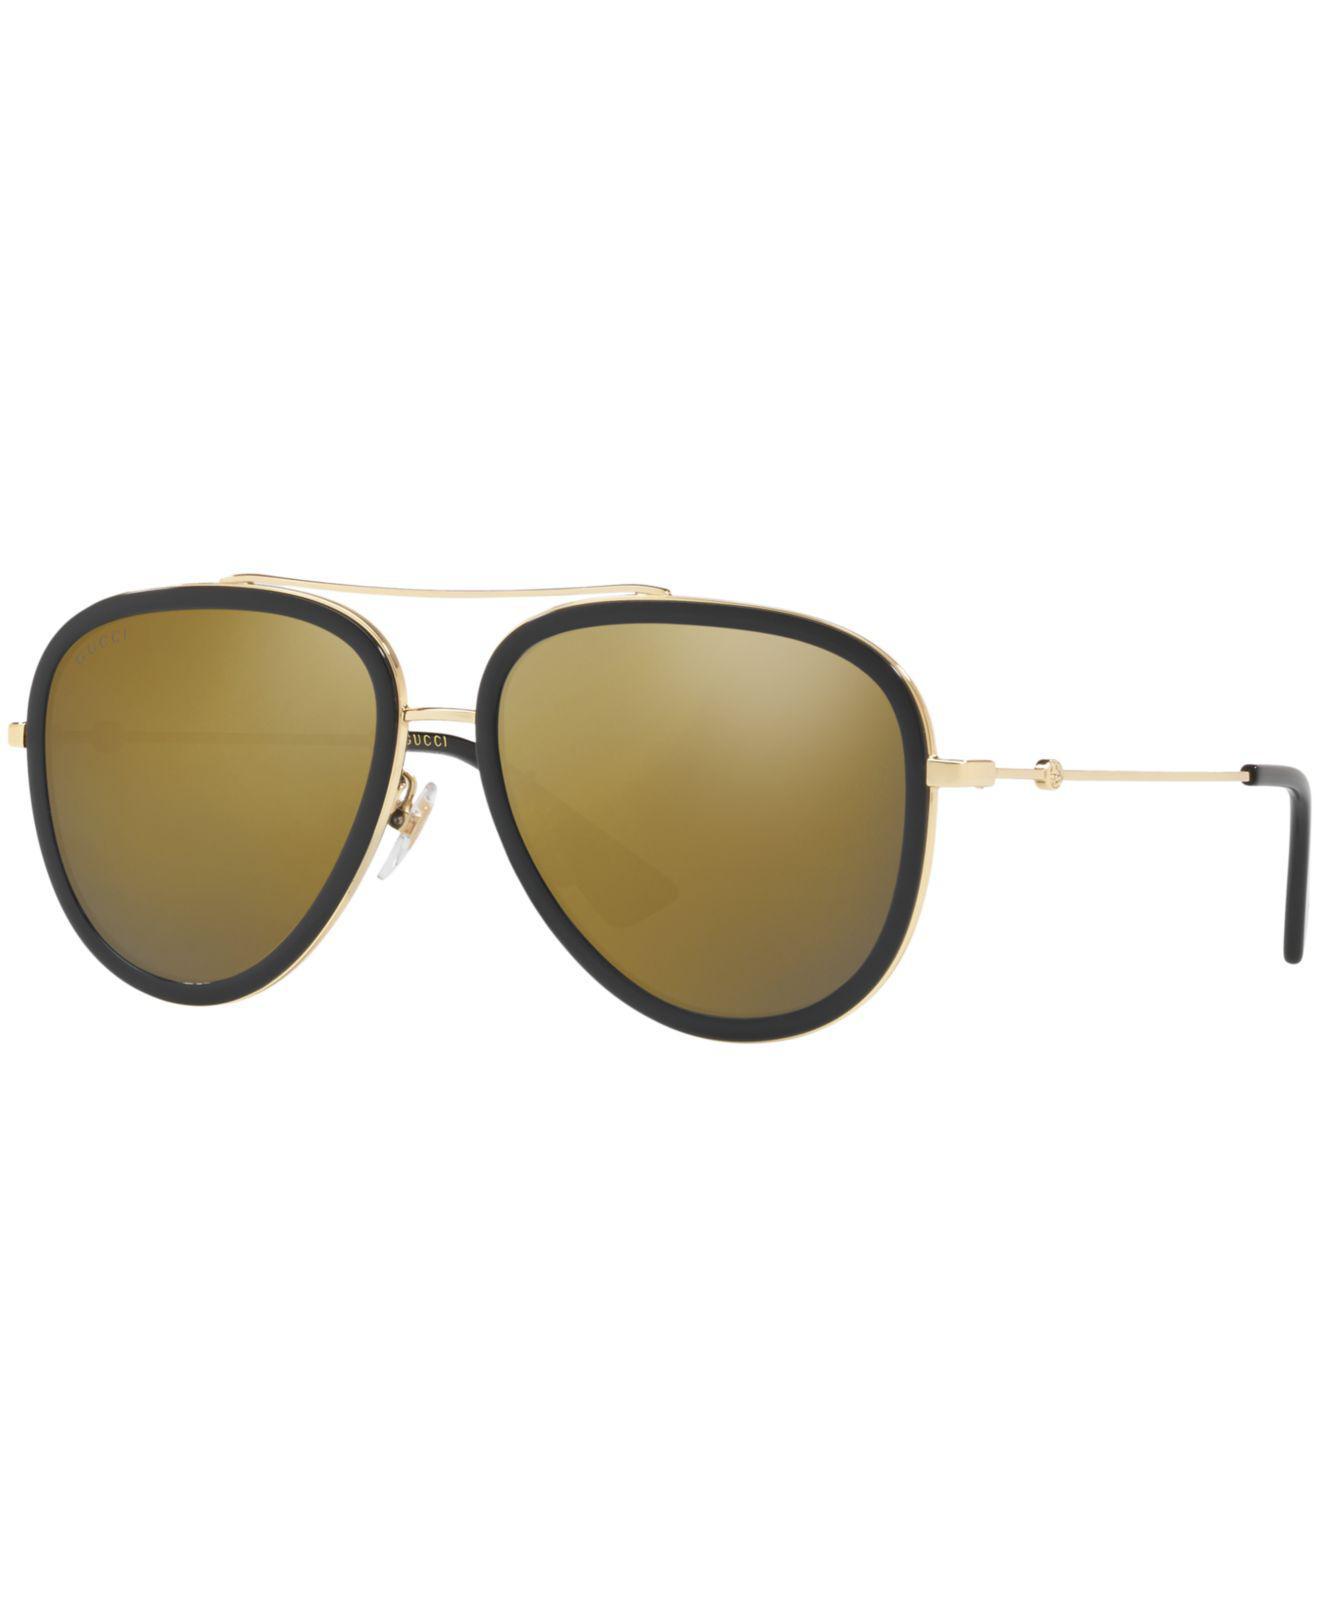 06b7c332c53 Gucci - Metallic Sunglasses